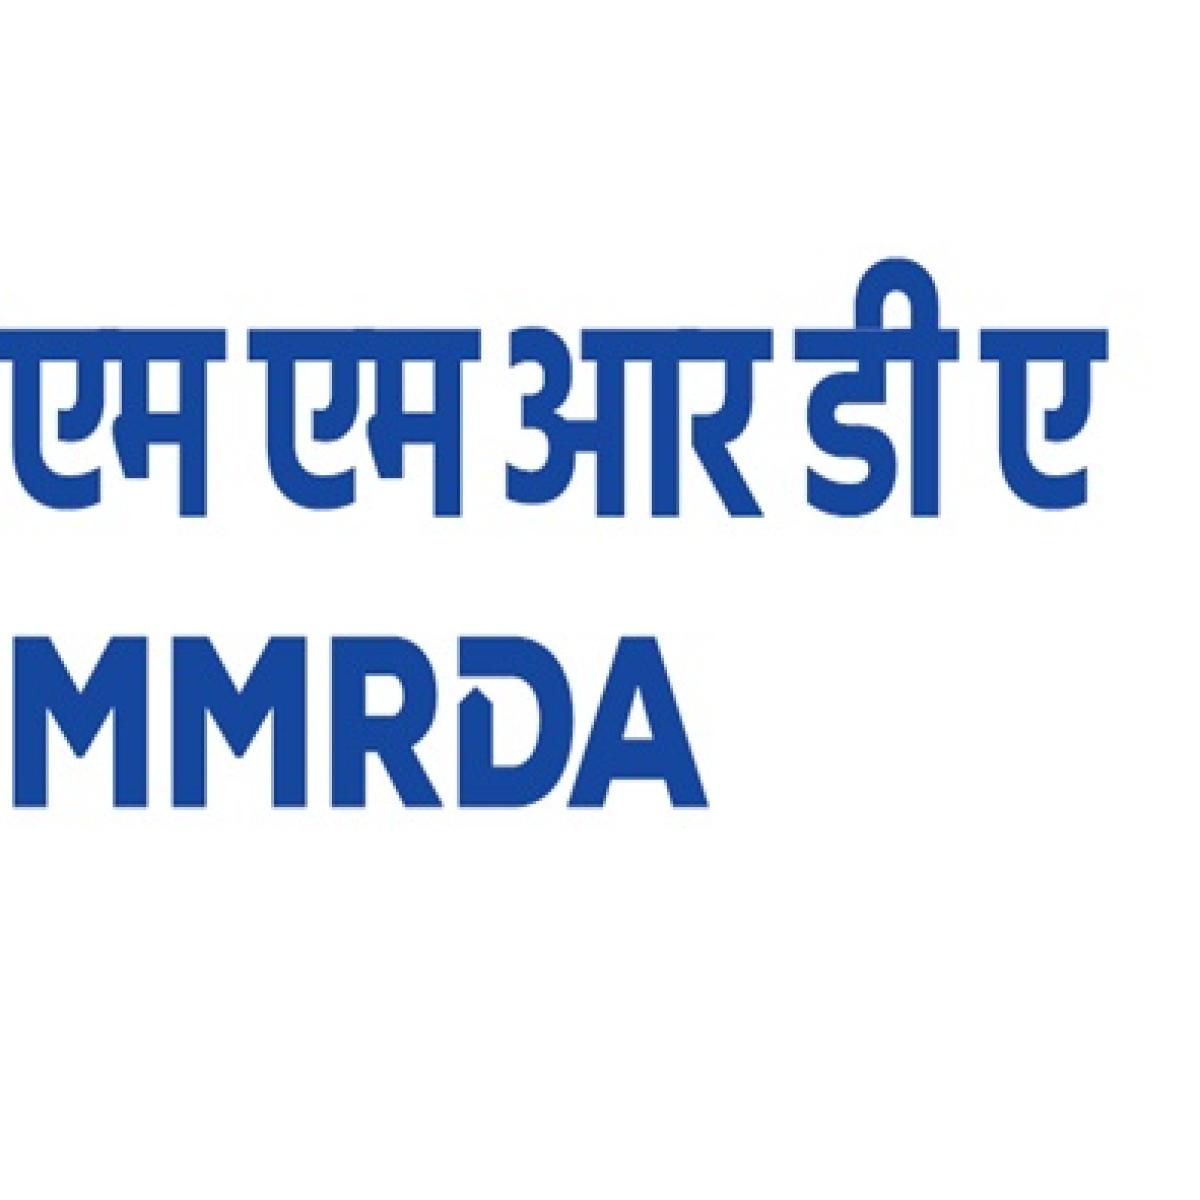 Mumbai: MMRDA proposes Alibaug-Virar corridor at Rs 19,000 crore